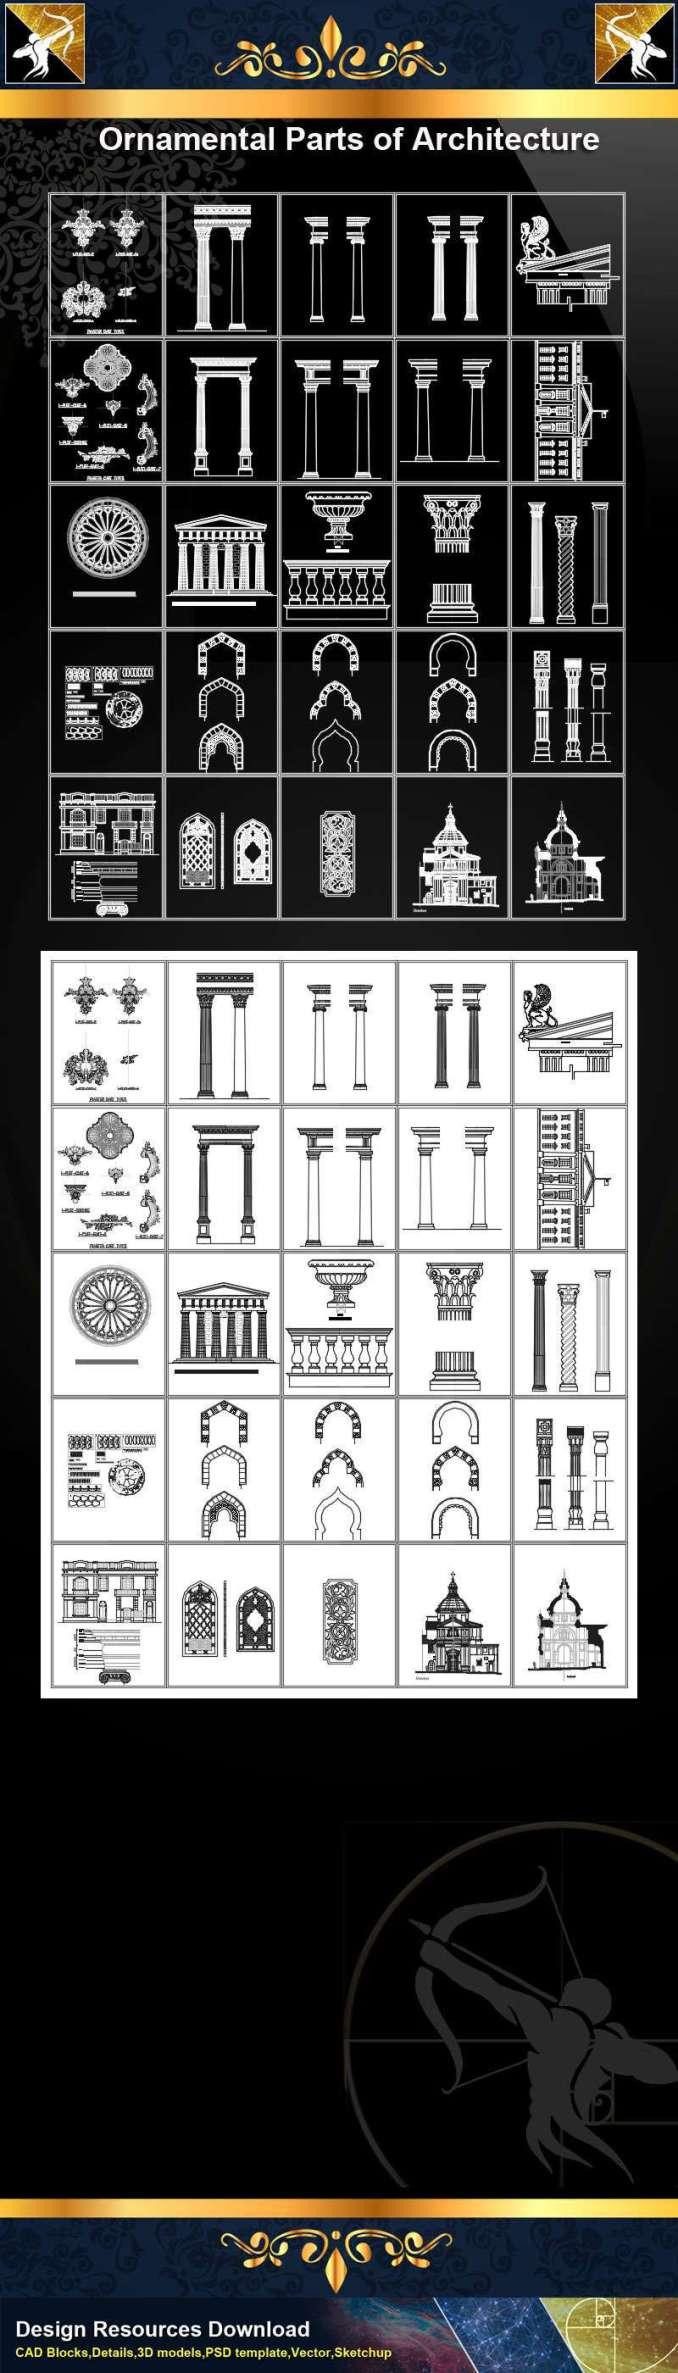 ★【Ornamental Parts of Architecture -Decoration Element CAD Blocks V.2】@Autocad Decoration Blocks,Drawings,CAD Details,Elevation